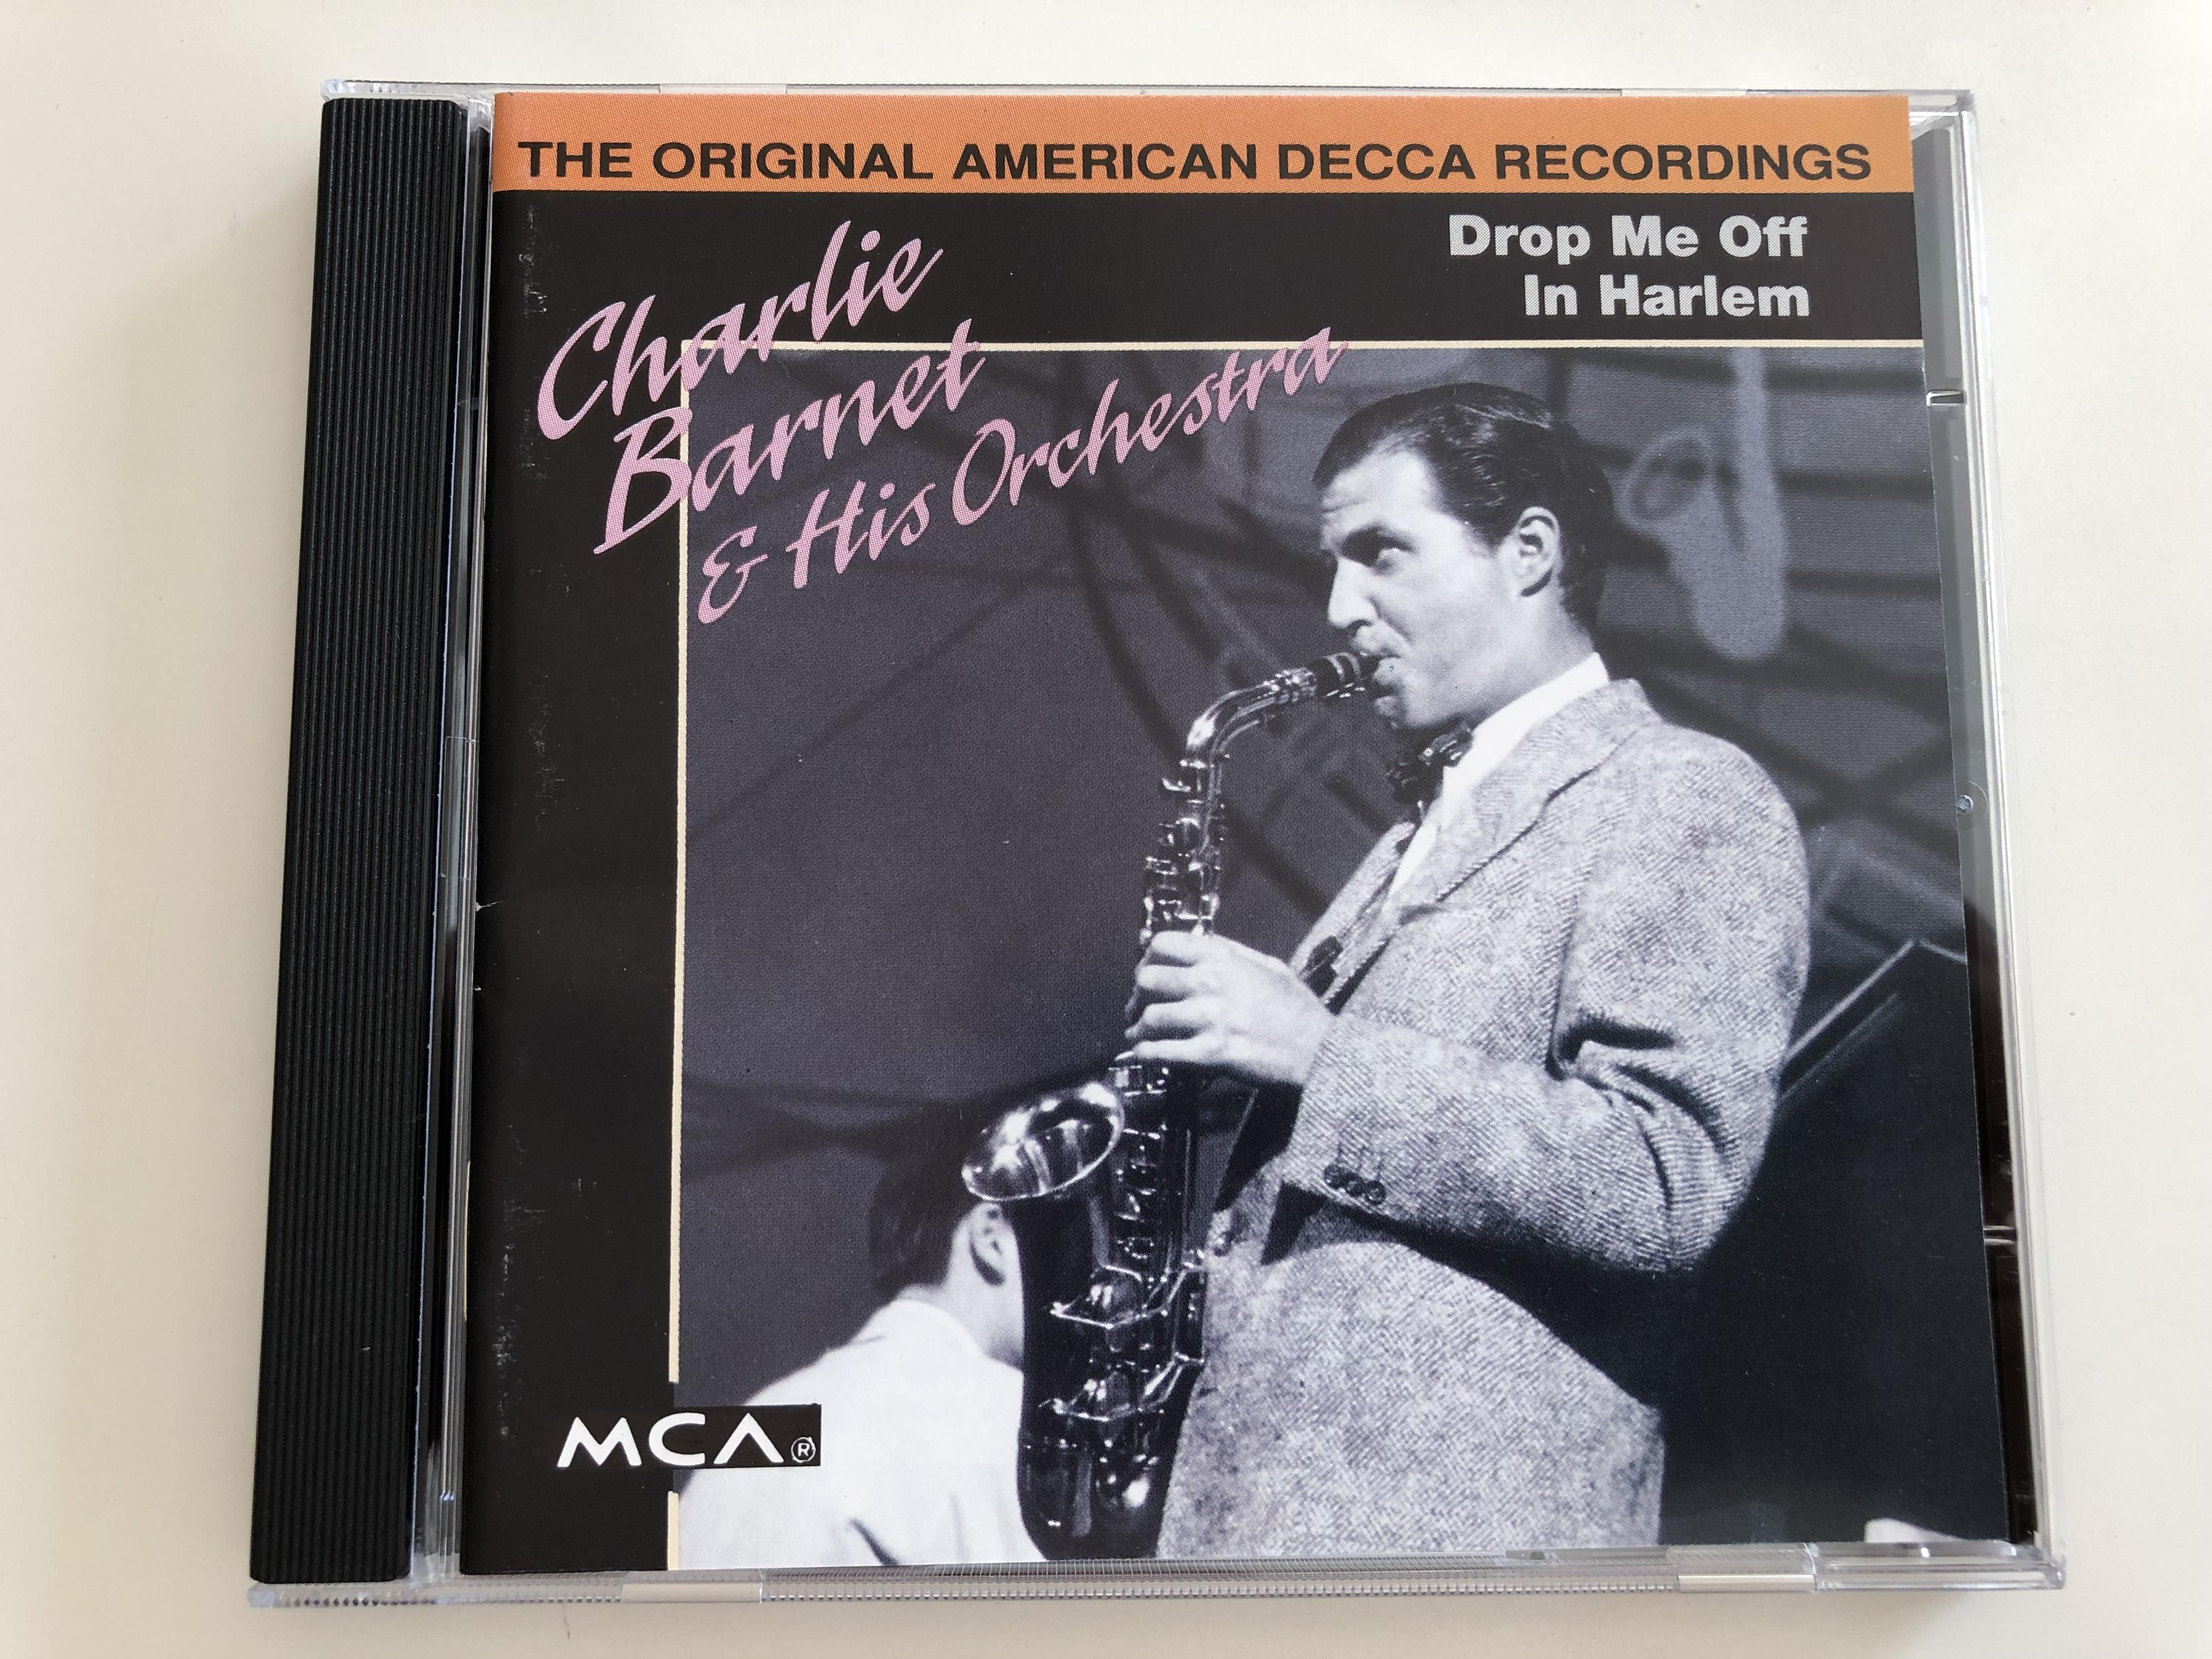 -charlie-barnet-his-orchestra-drop-me-off-in-harlem-the-original-american-decca-recordings-audio-cd-1992-grp-6122-1-.jpg